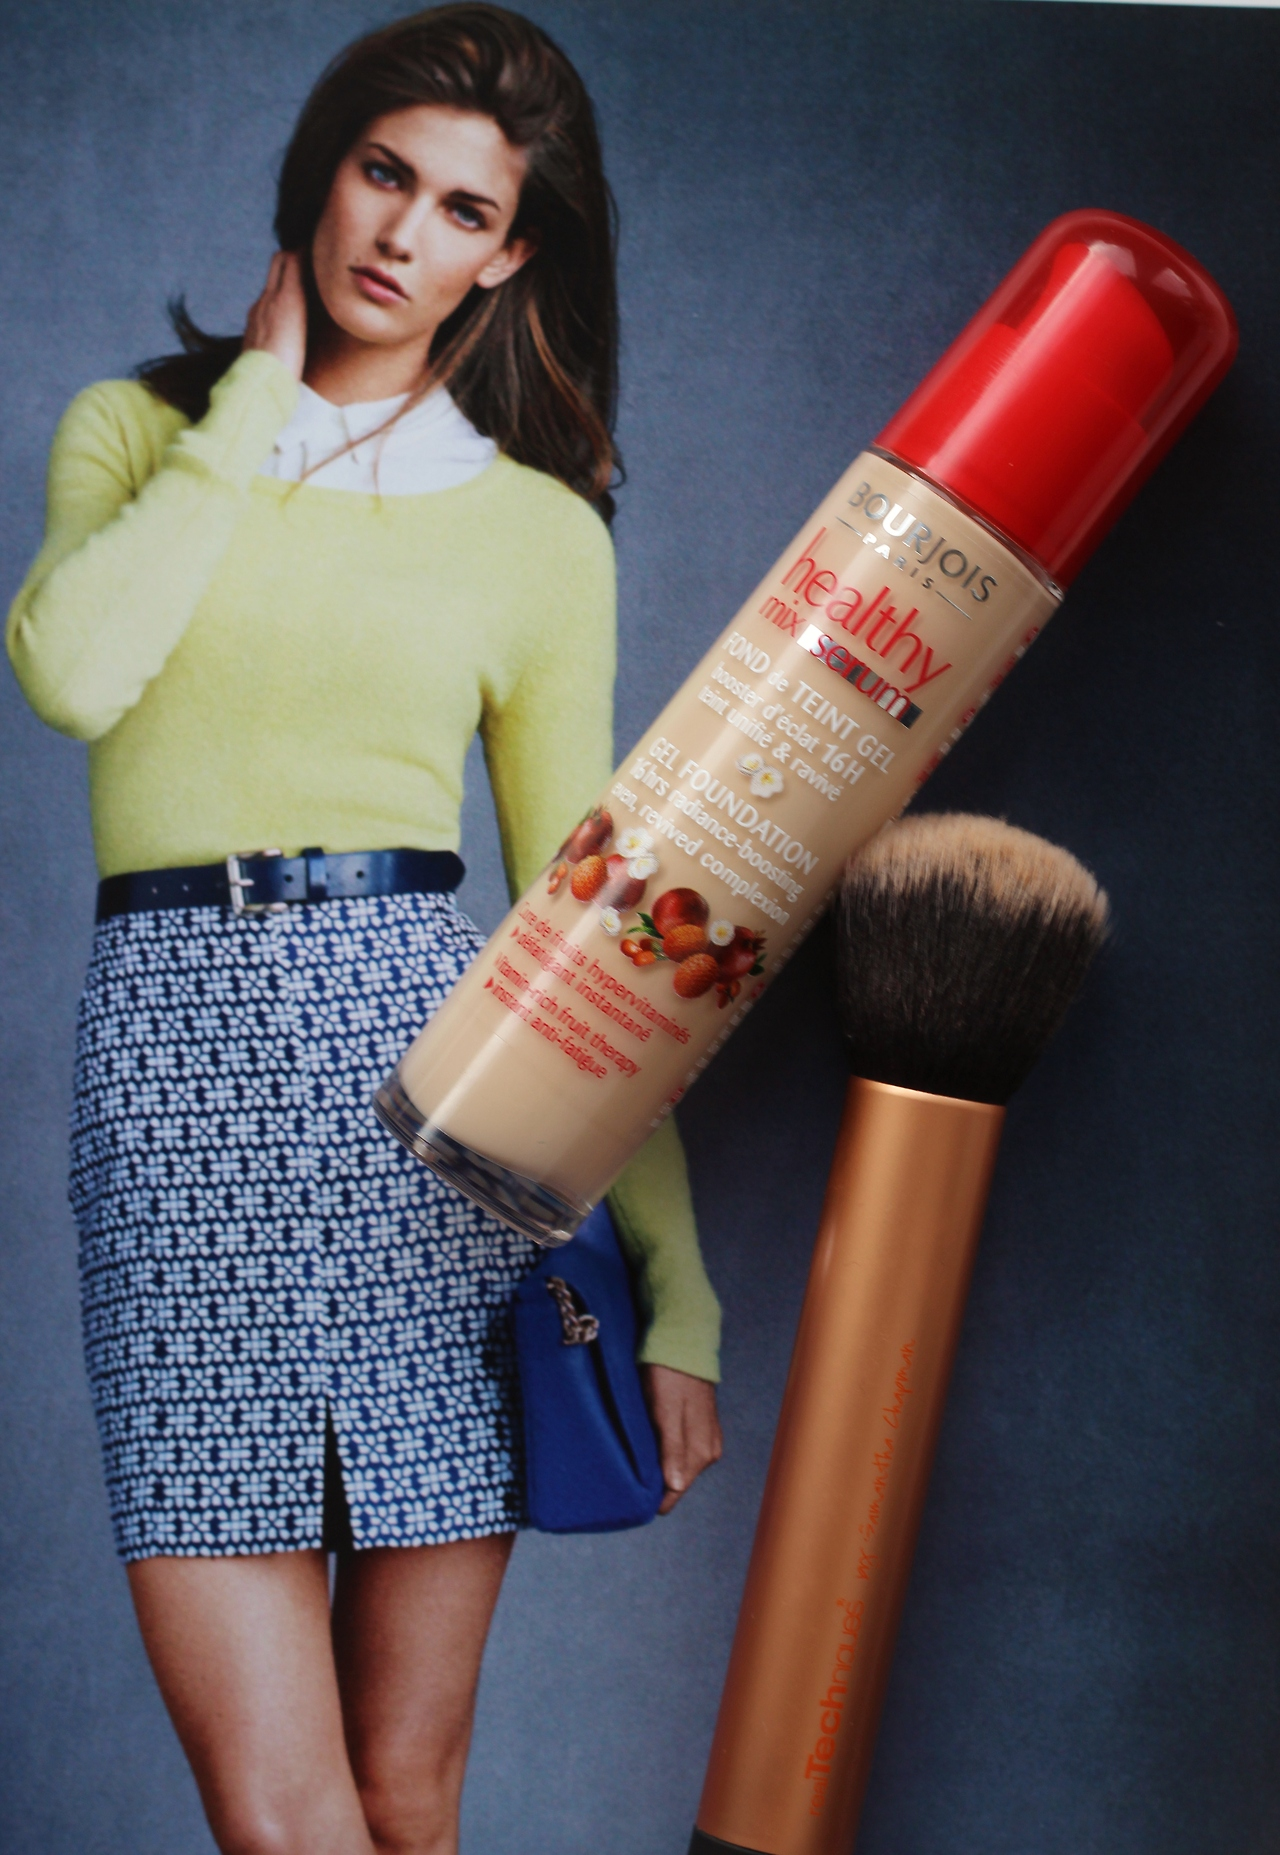 Bobbi Brown Long Wear Dupe, Bourjois Healthy Mix Serum